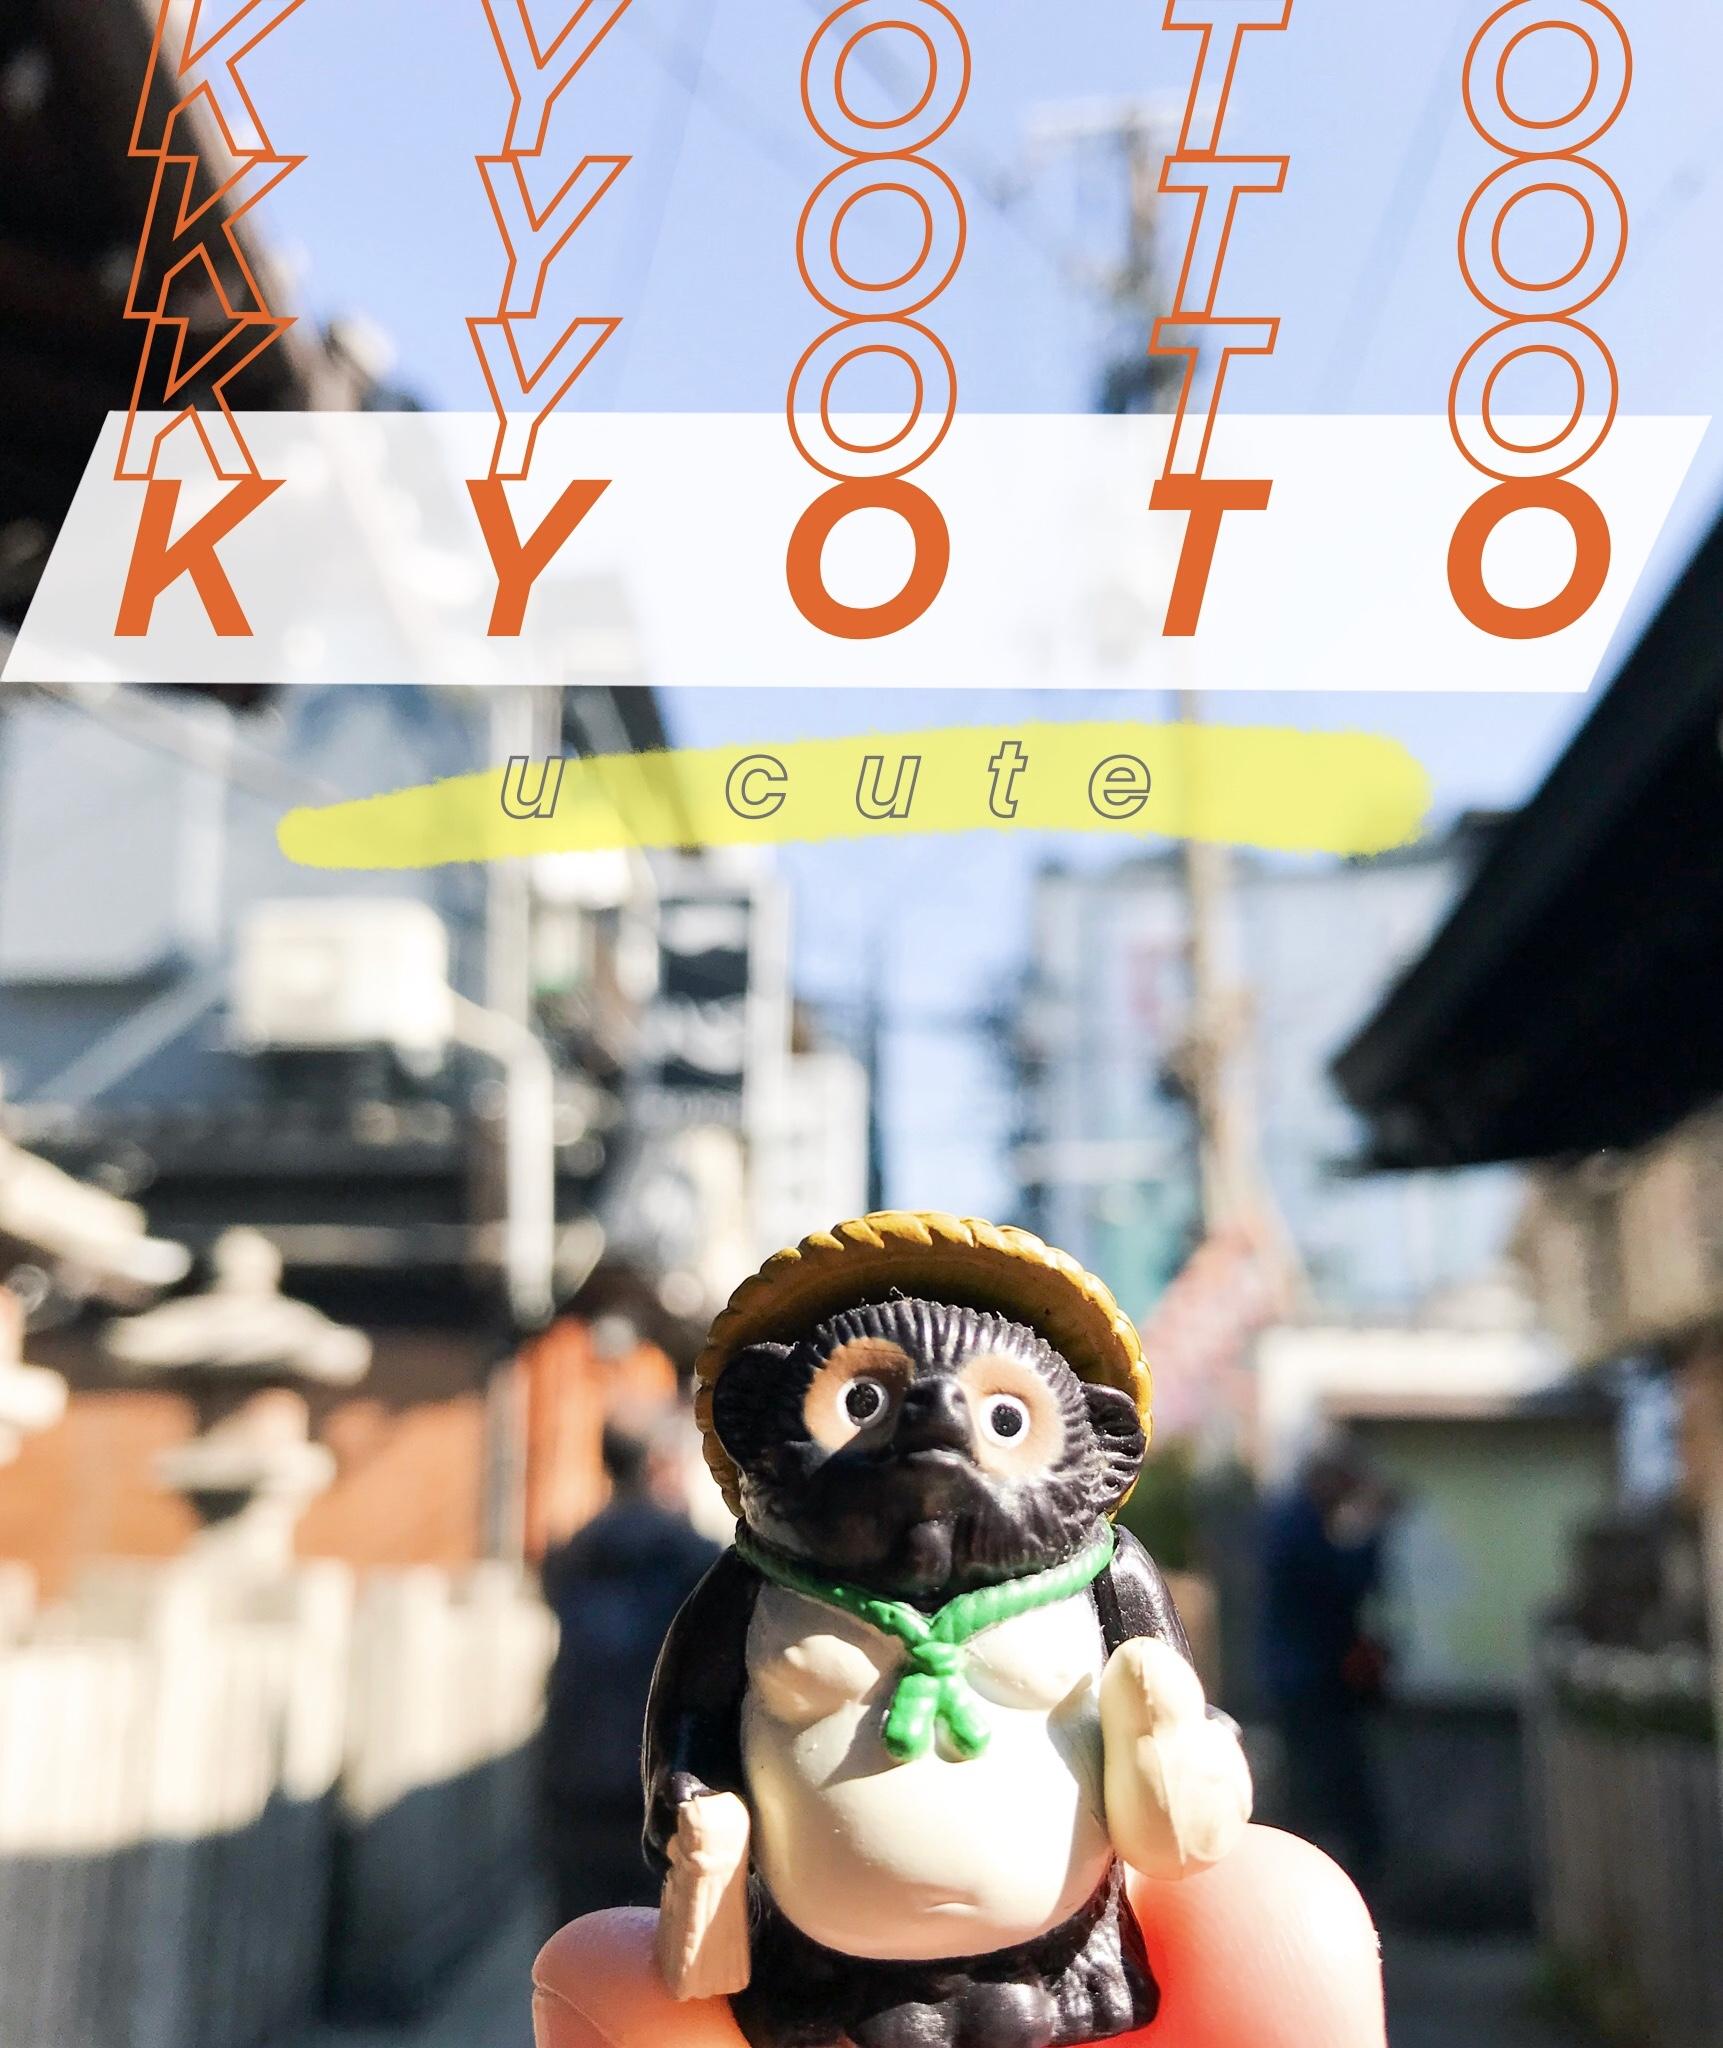 kyoto cover.jpg